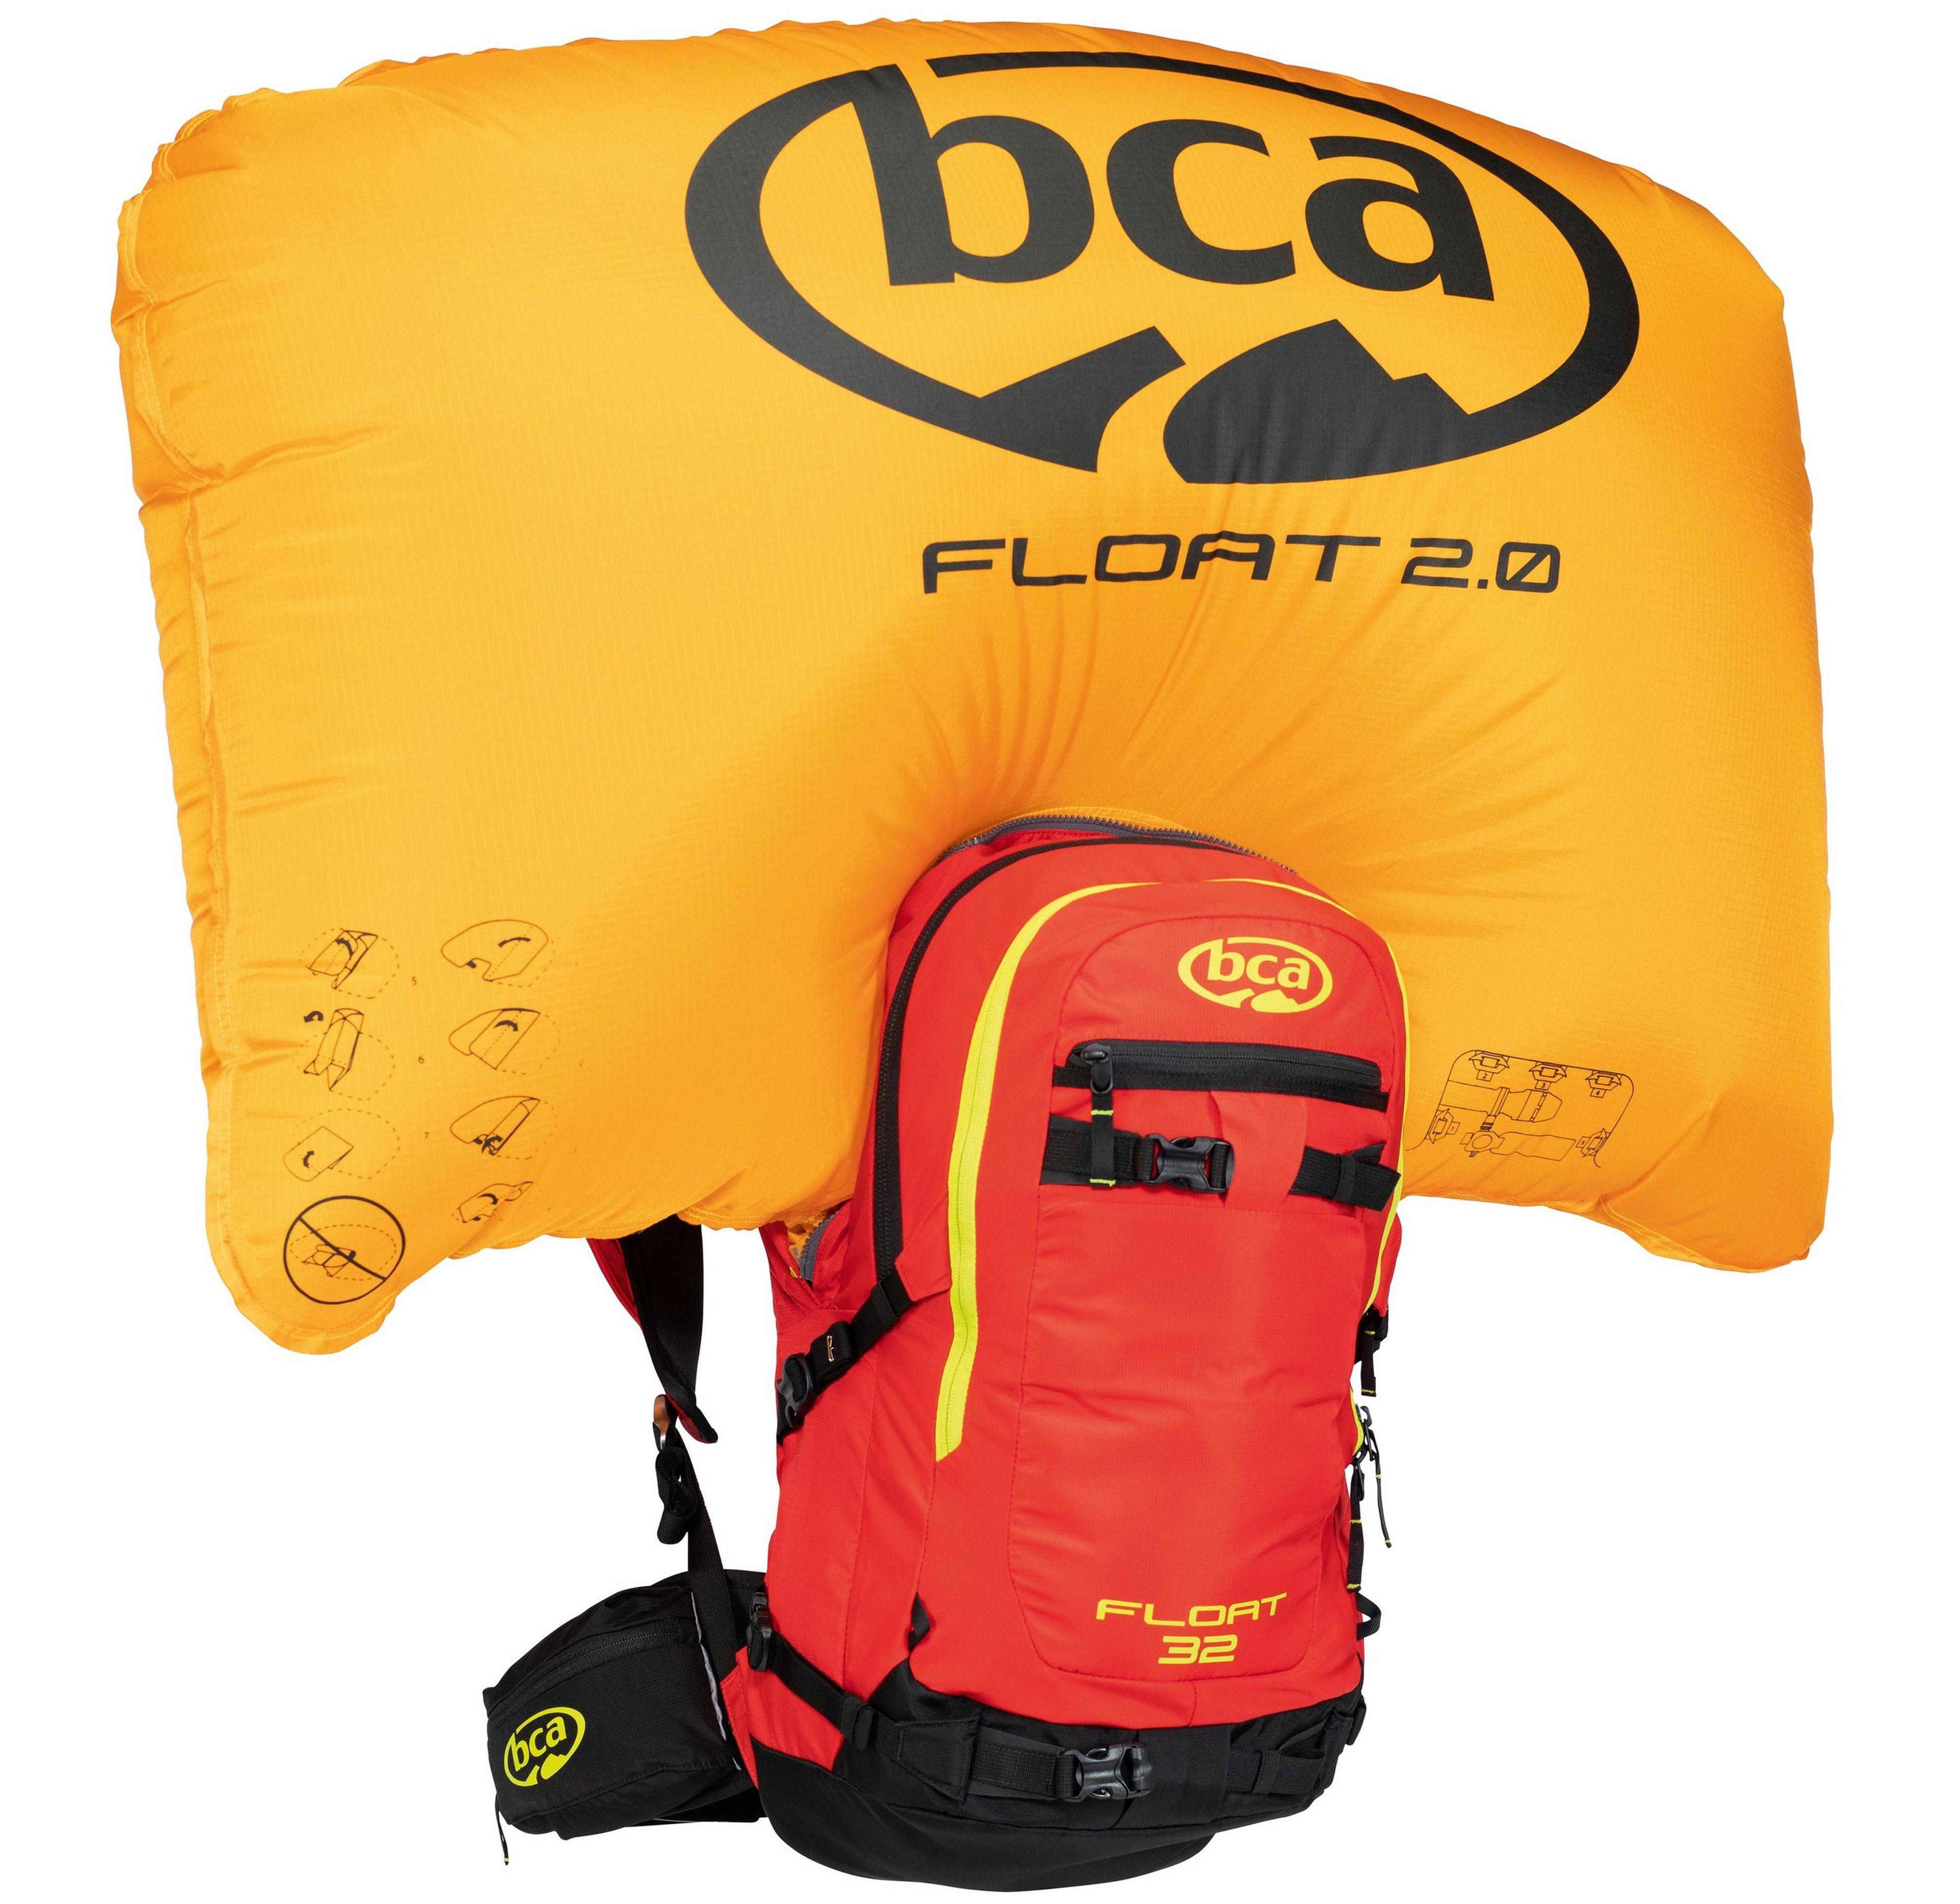 BCA avalanche airbag